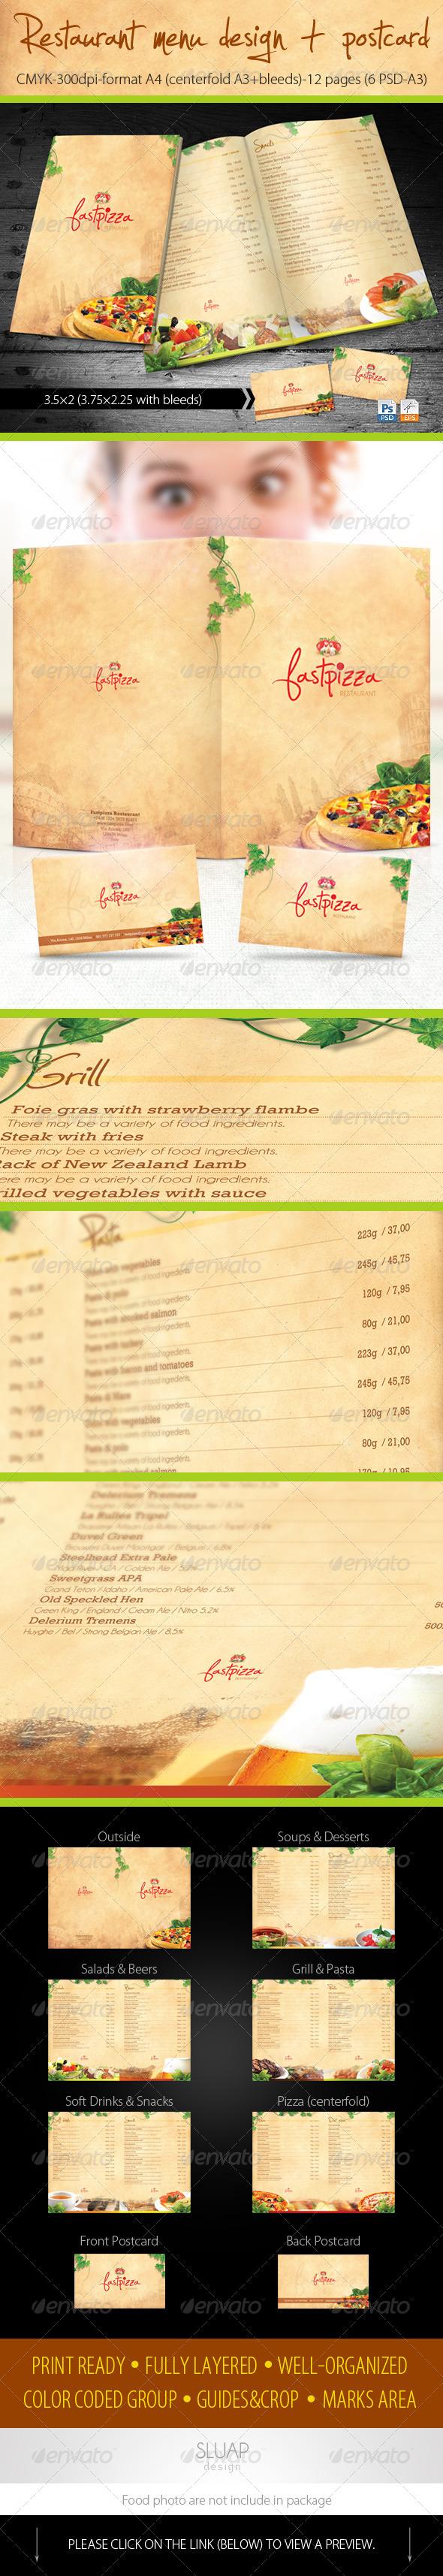 Restaurant Menu Design + Postcard - Food Menus Print Templates